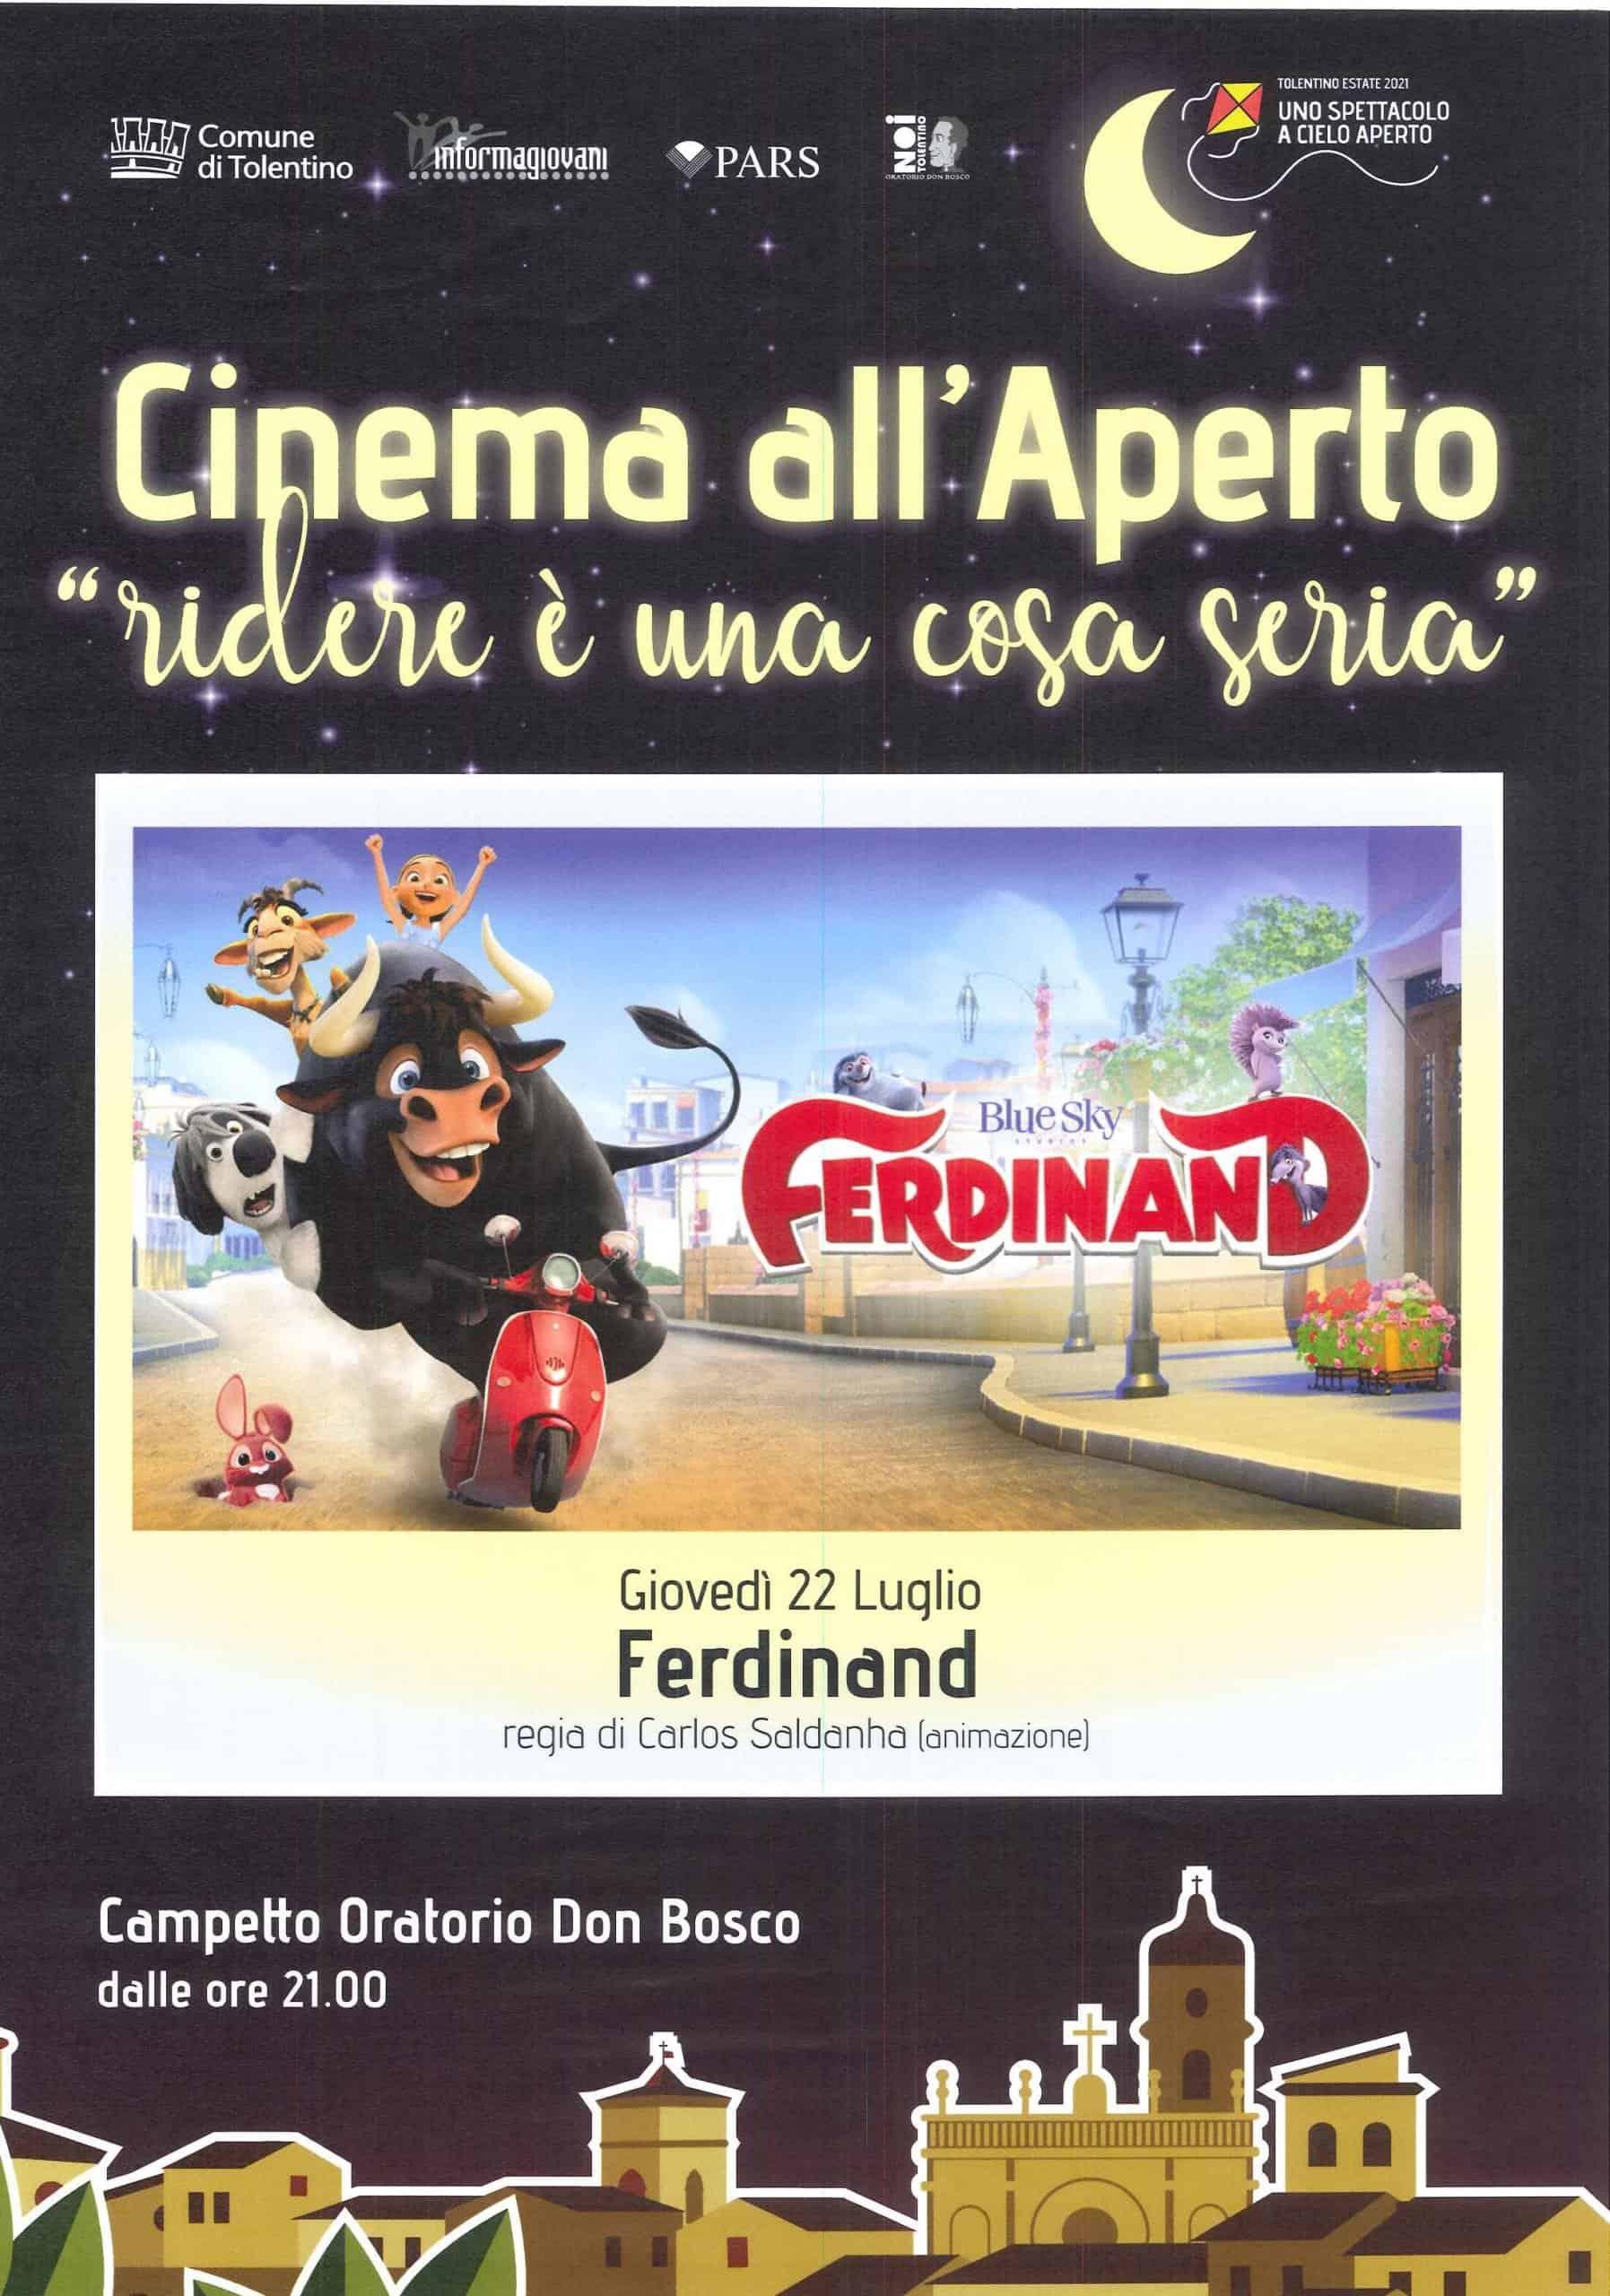 FERDINAND - Cinema all'Aperto